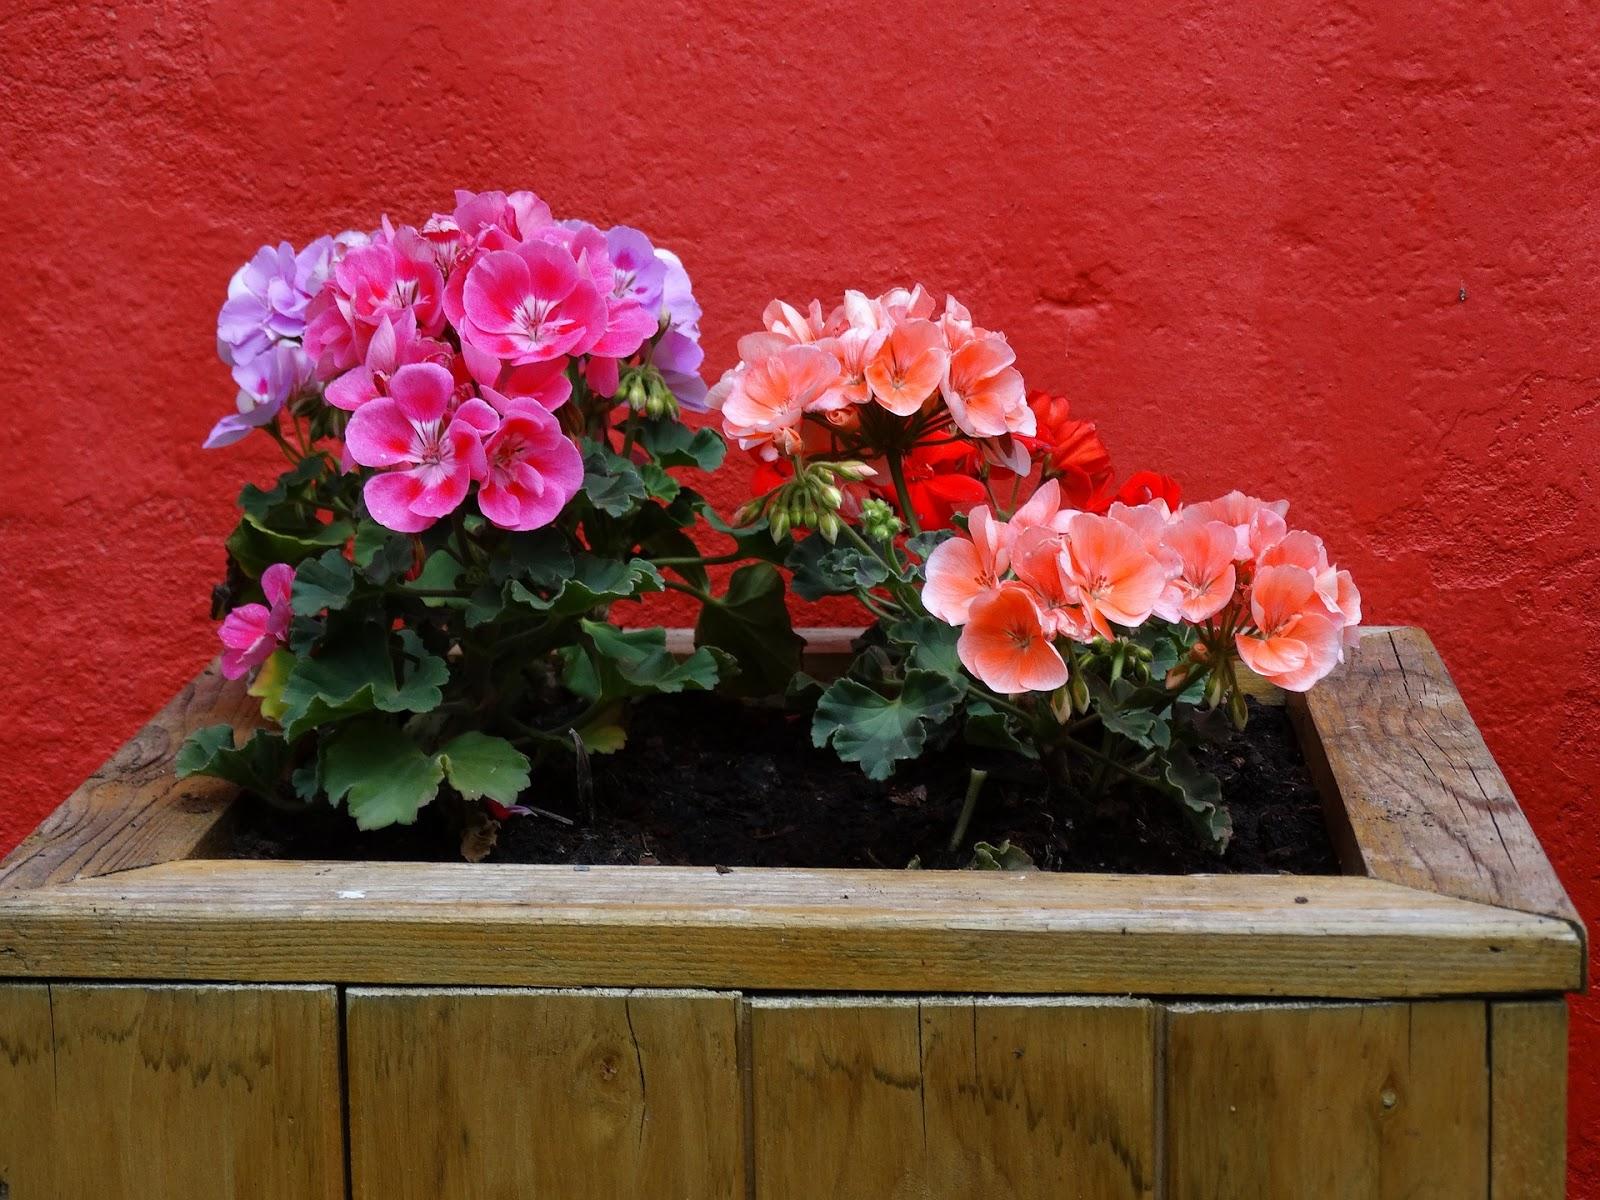 Как нарисовать цветок на заборе краской